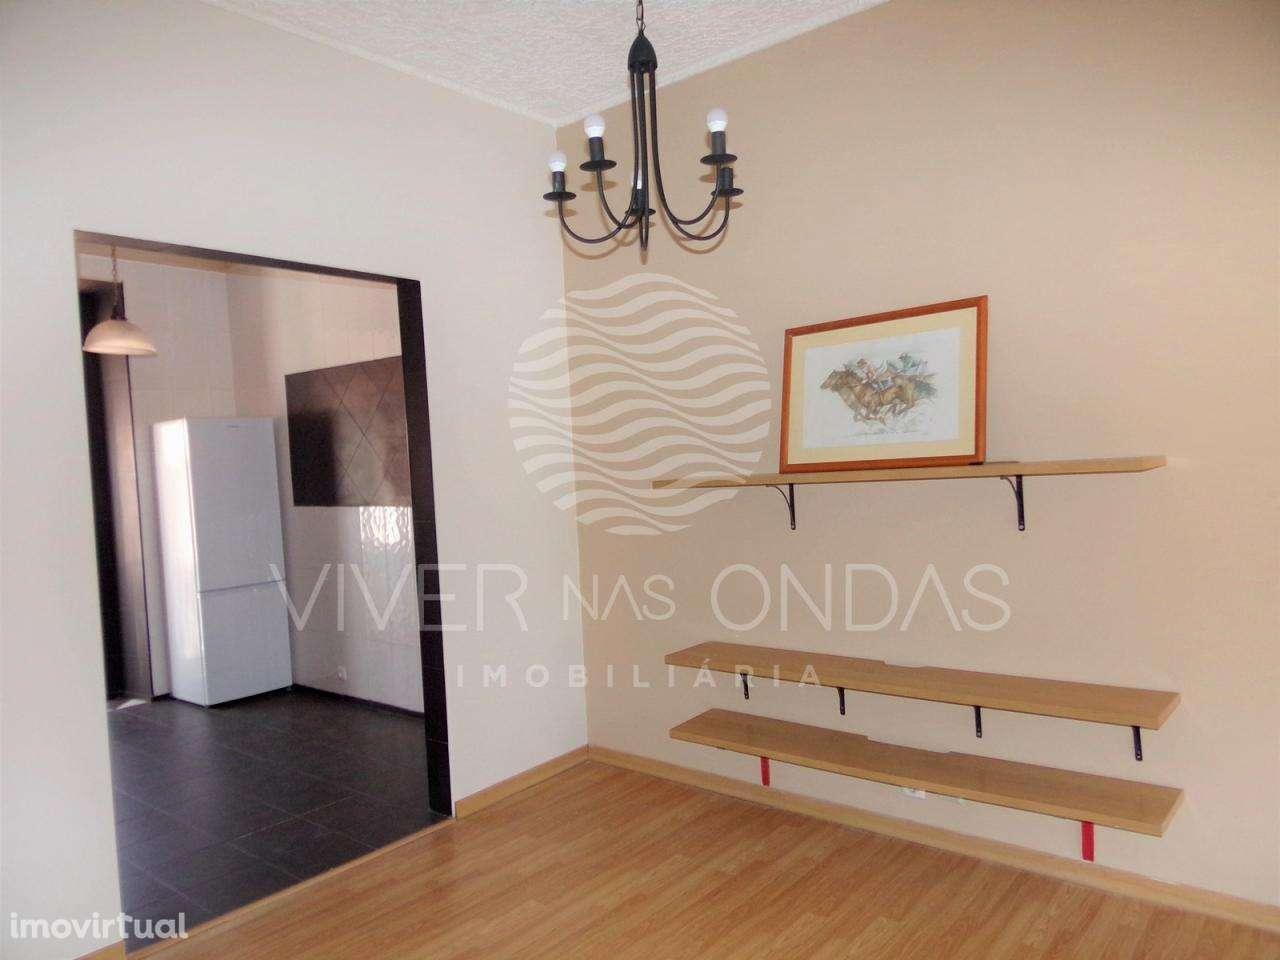 Apartamento para comprar, Beato, Lisboa - Foto 7